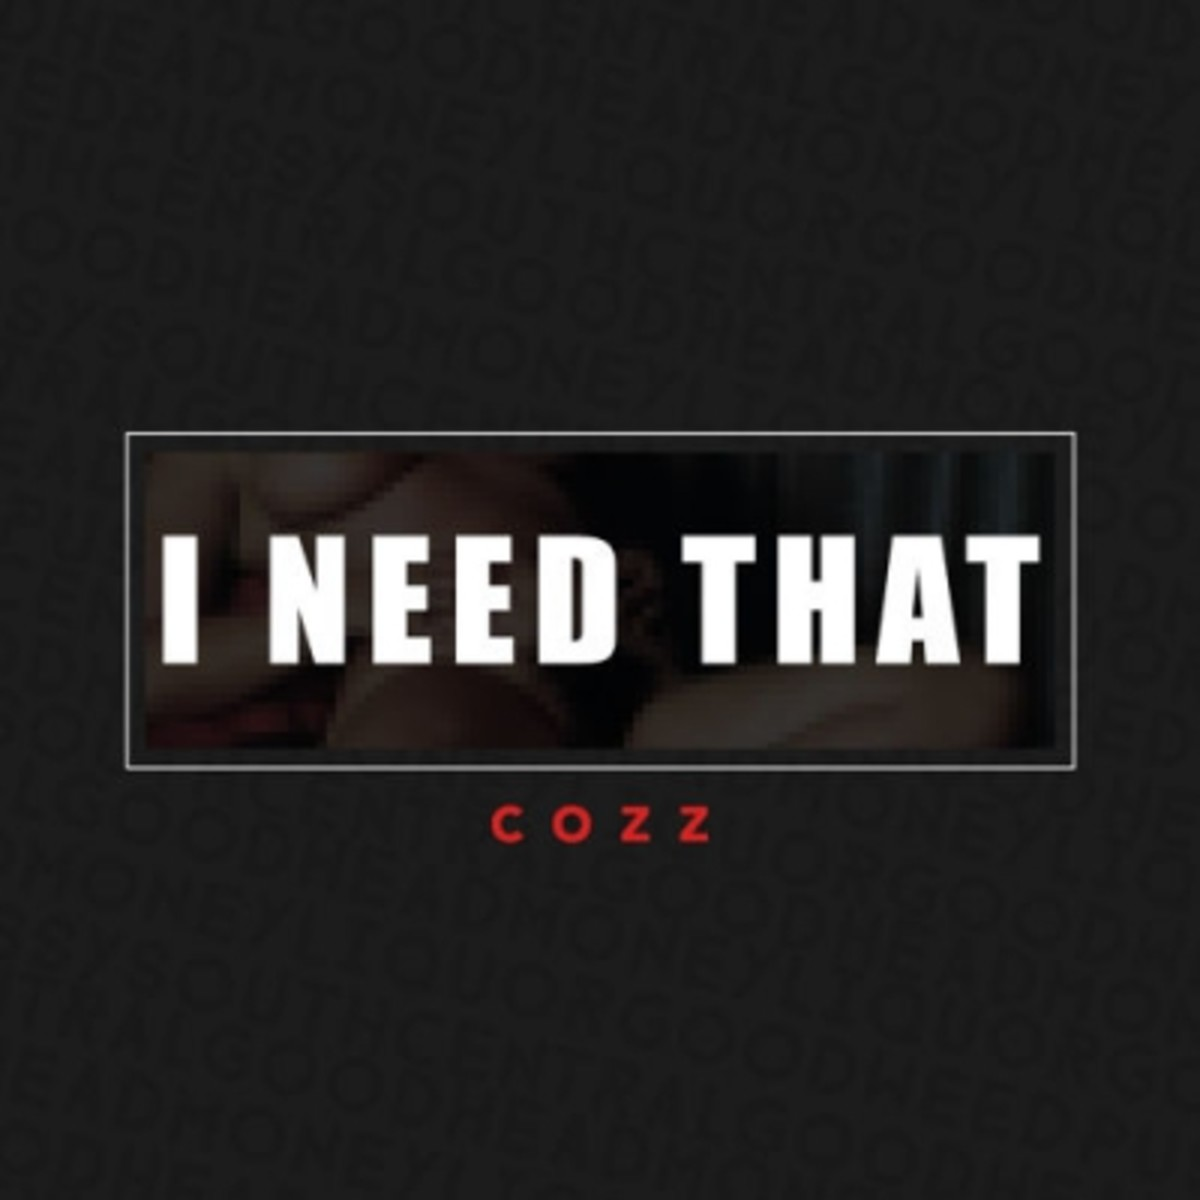 cozz-i-need-that.jpg